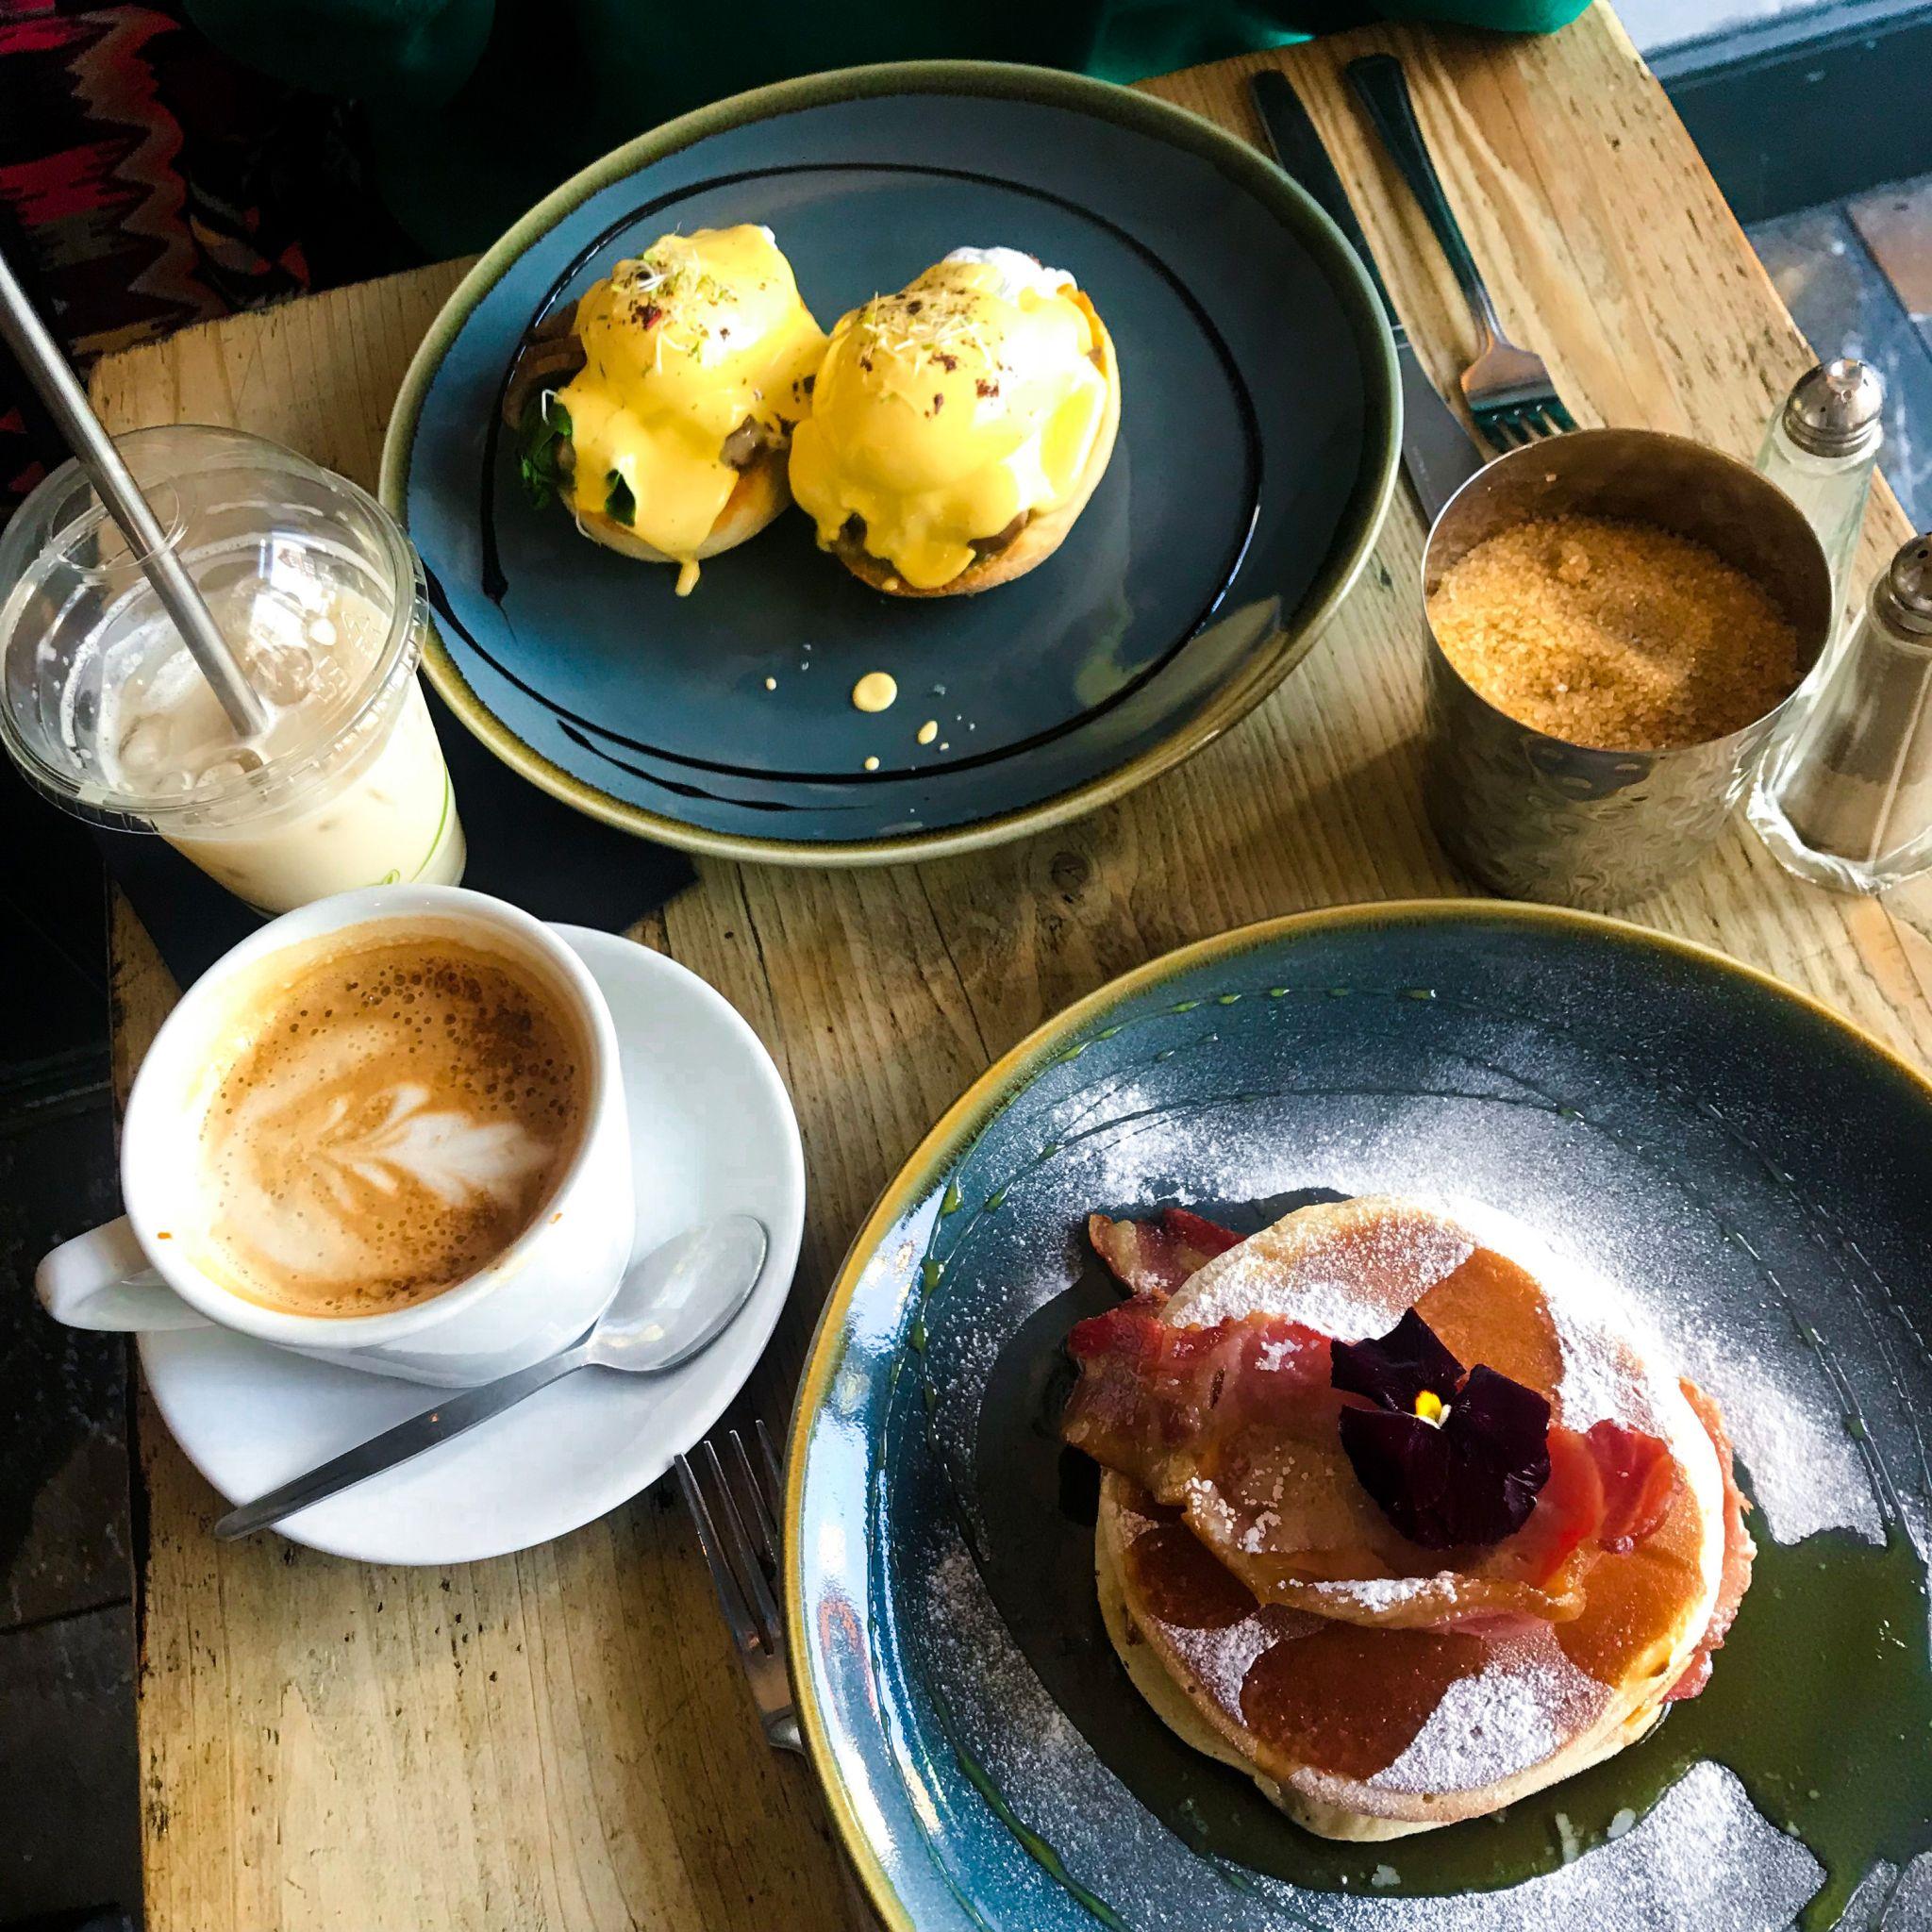 yasmin stefanie jenni roberts brighton hove brunch cafe coho pancakes eggs benedict